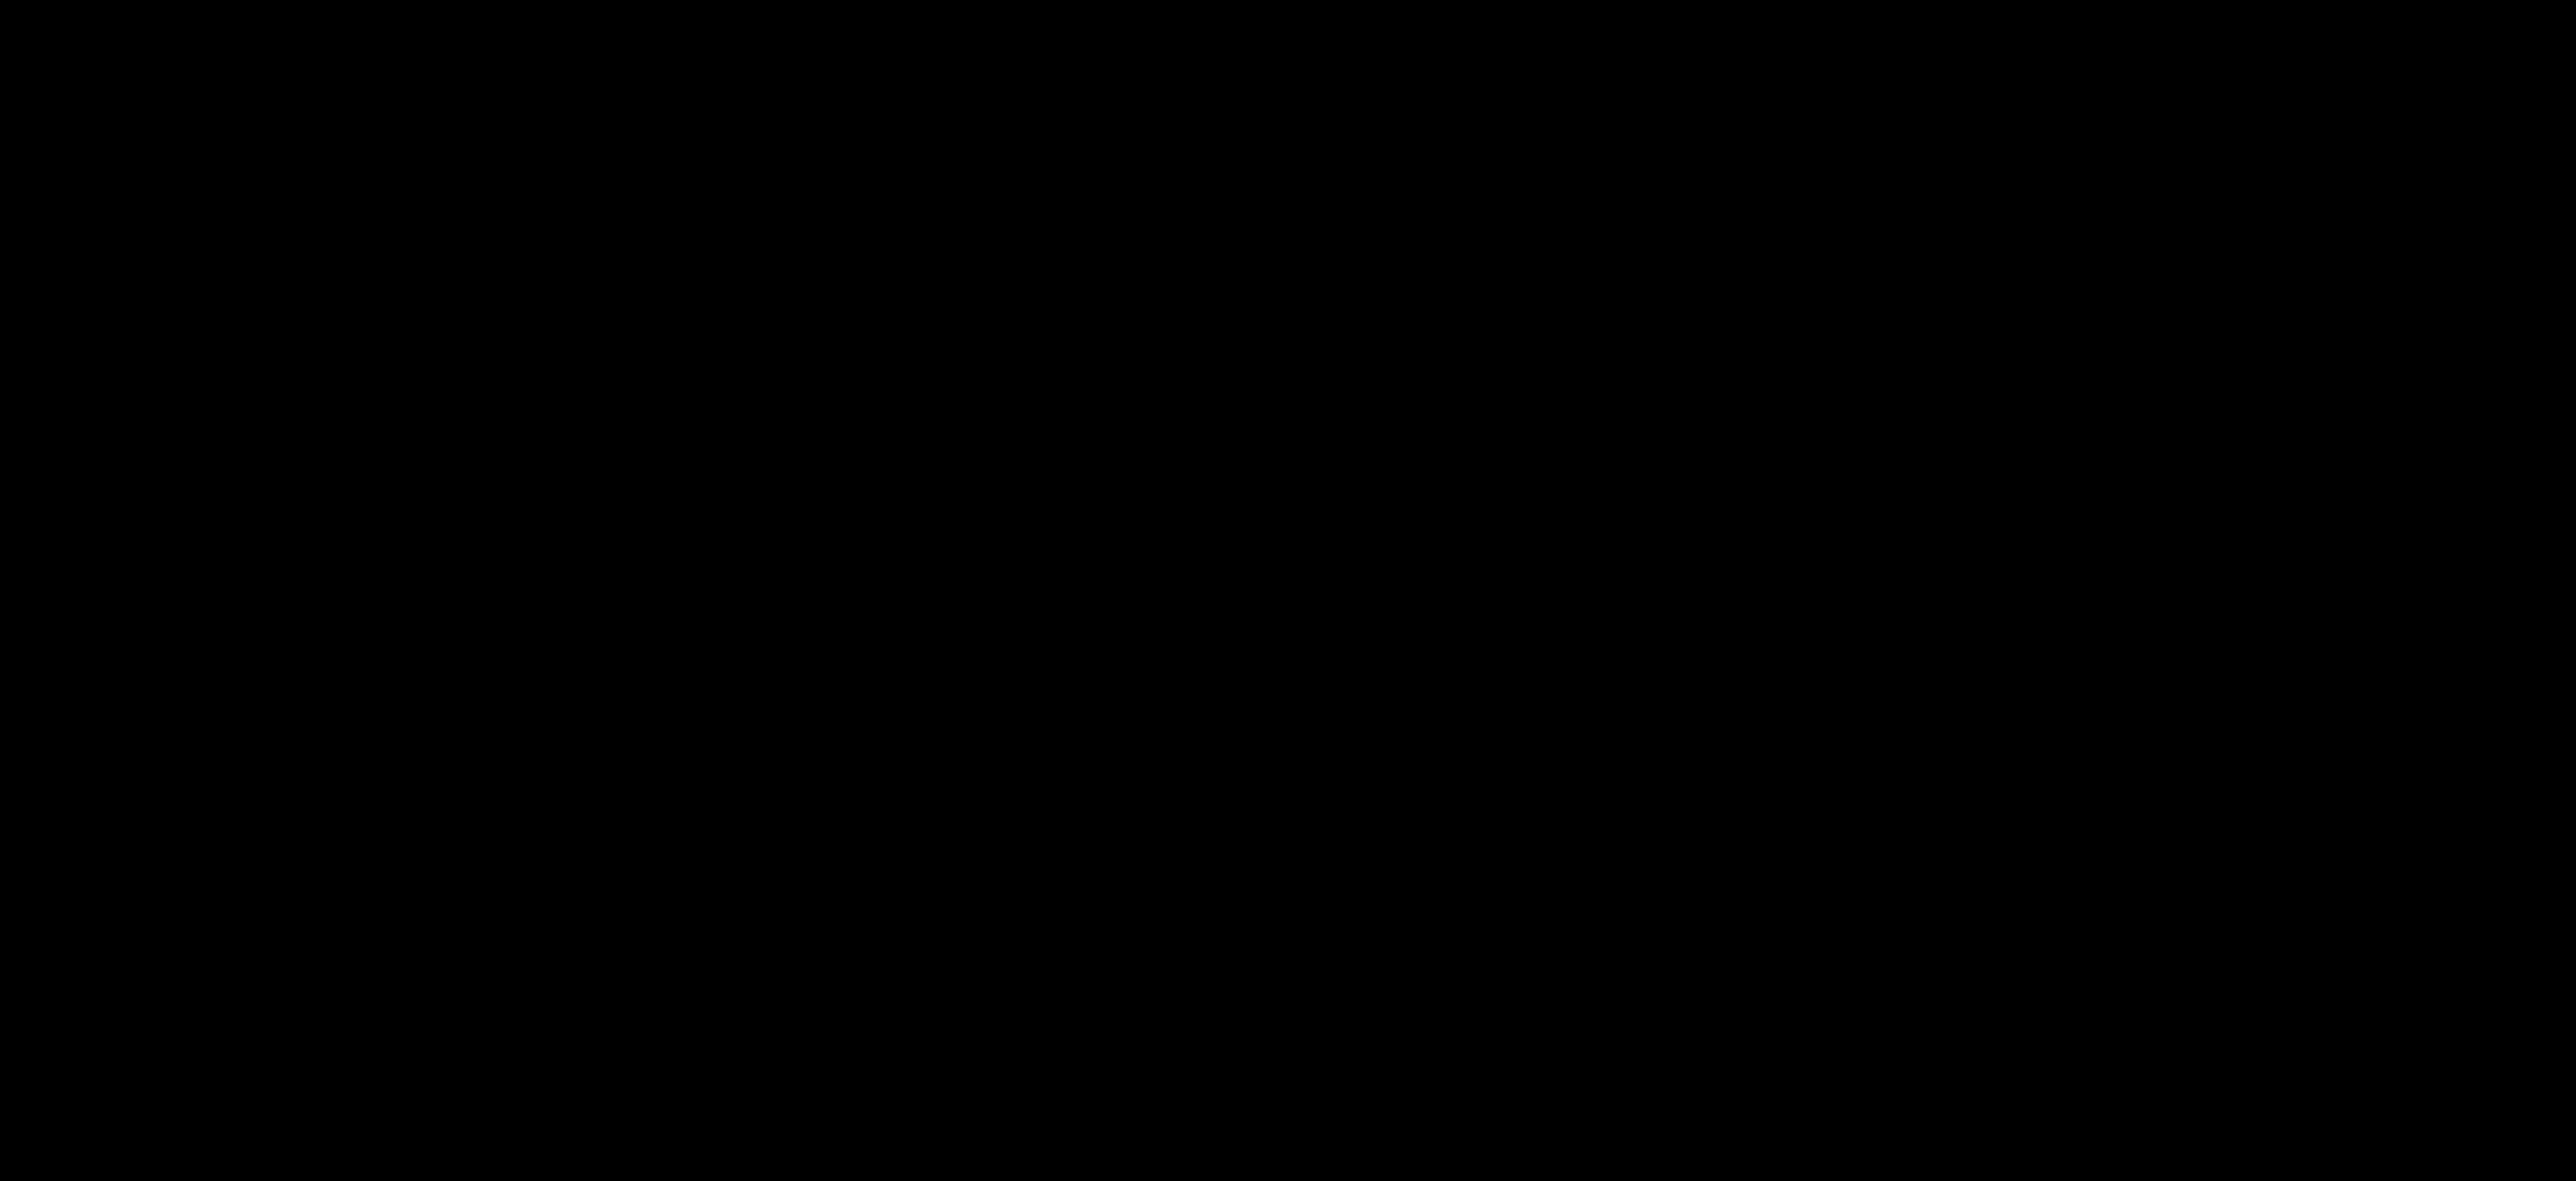 autocad-lt-2017-logotype-1-line-screen